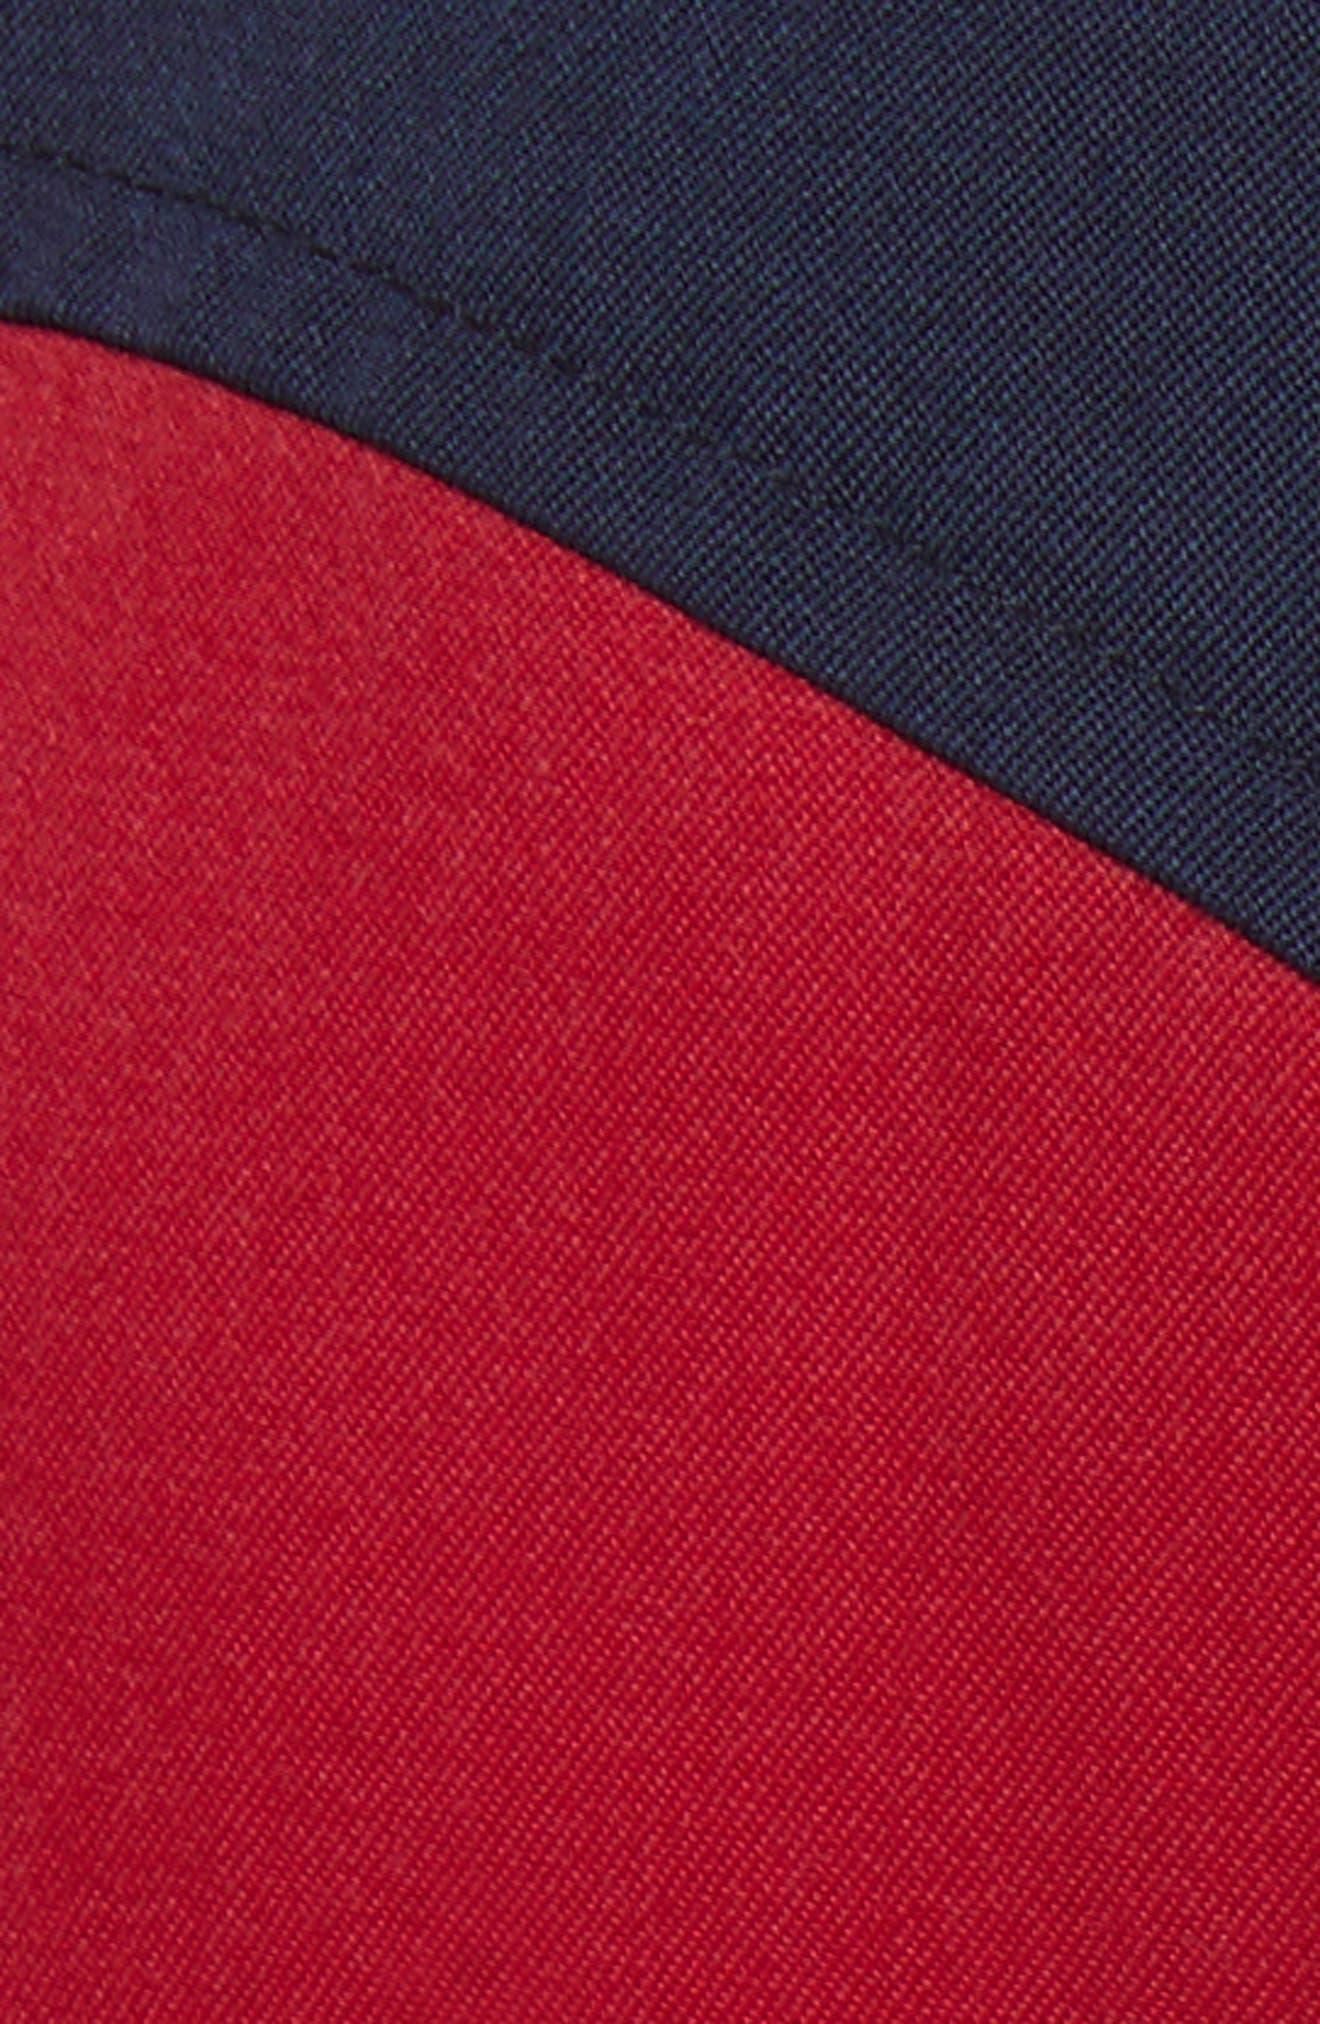 Alternate Image 6  - CALVIN KLEIN 205W39NYC Colorblock Wool Trousers